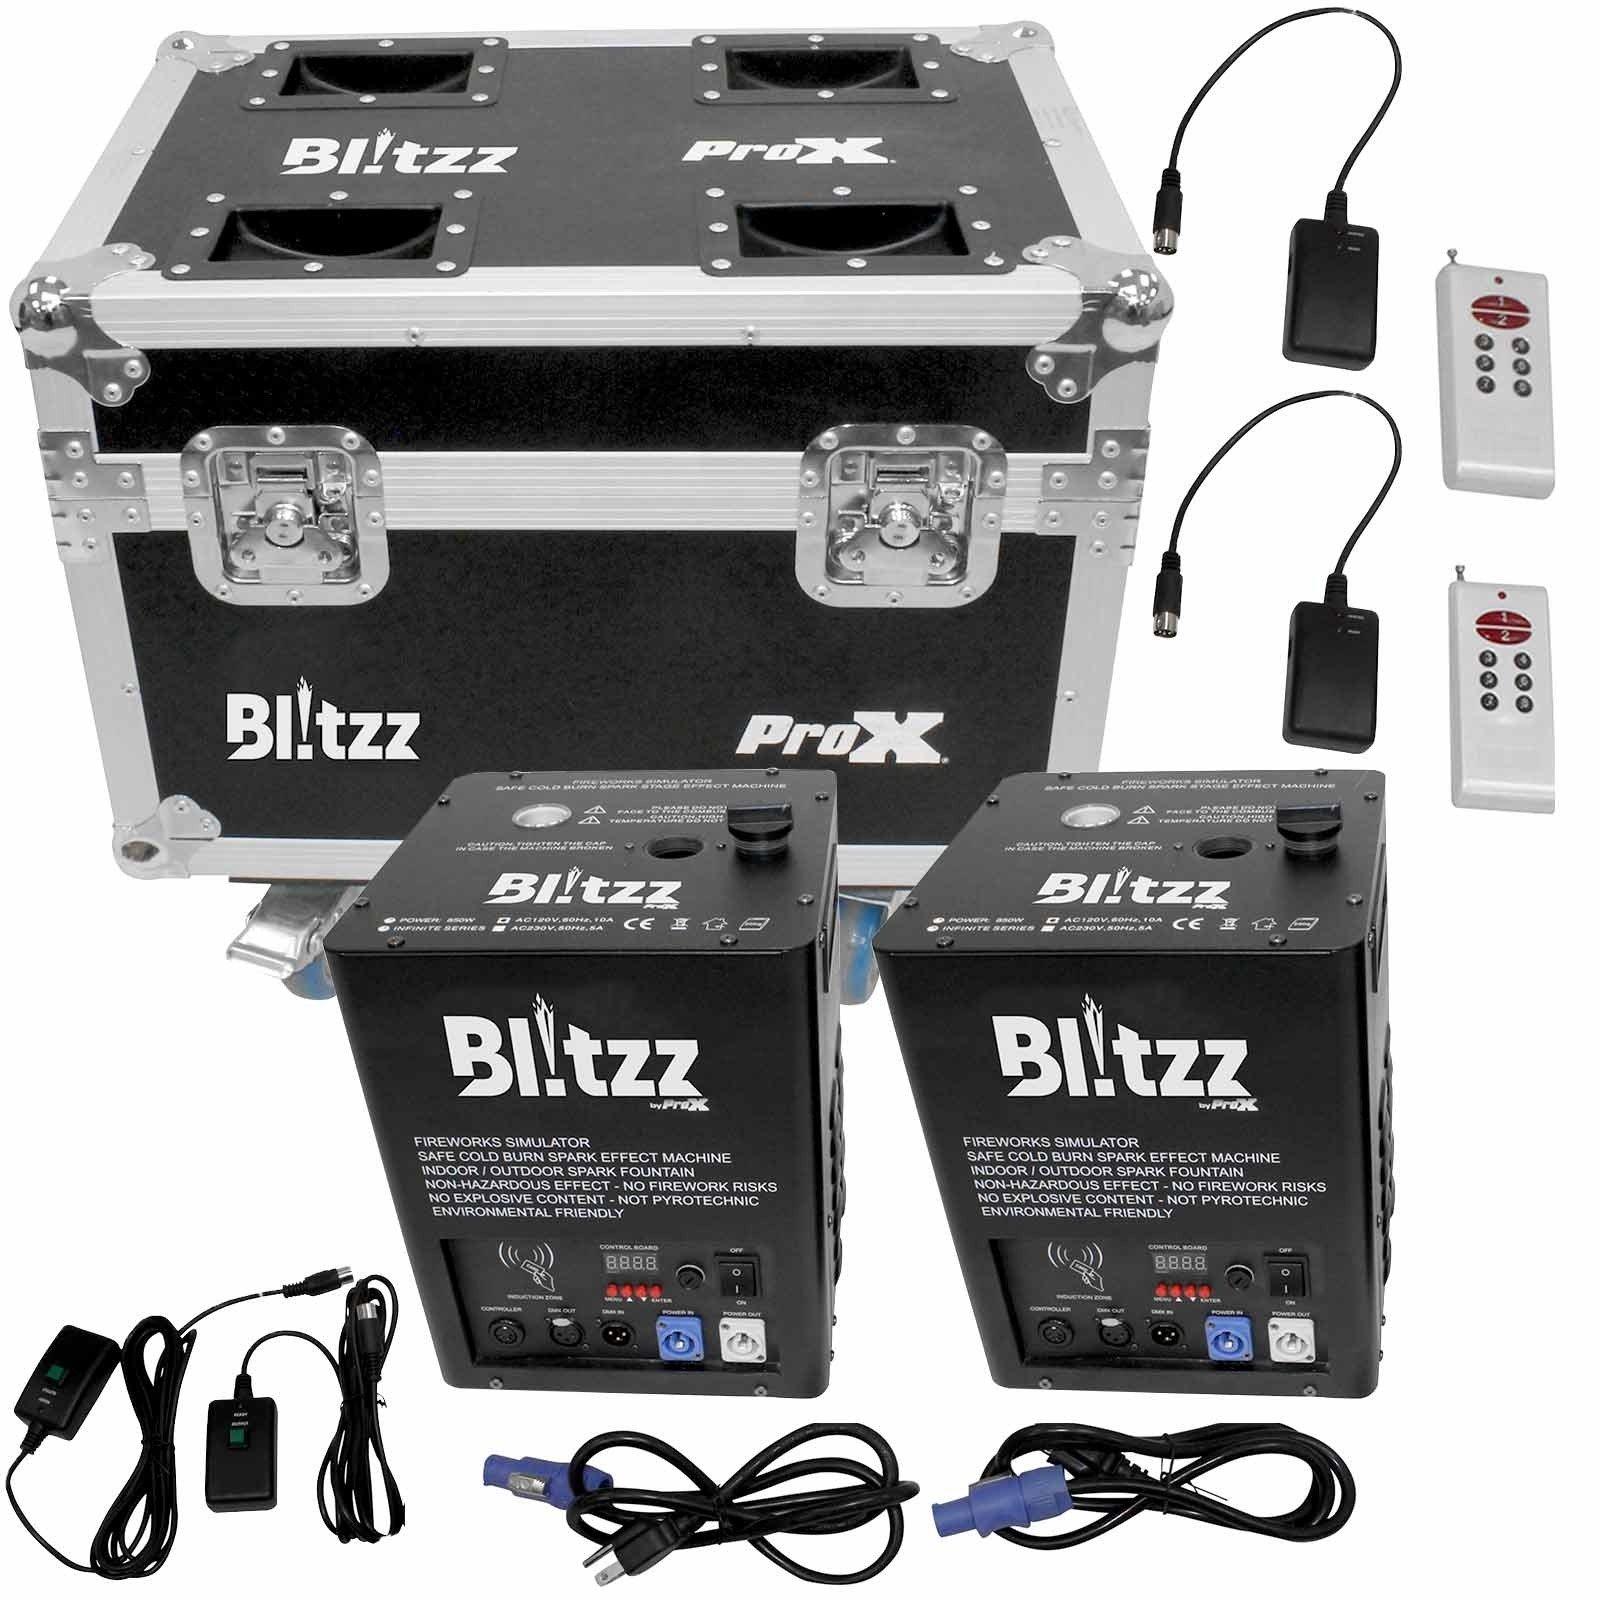 BLITZZ WIRELESS CONTROLLER DRIVER